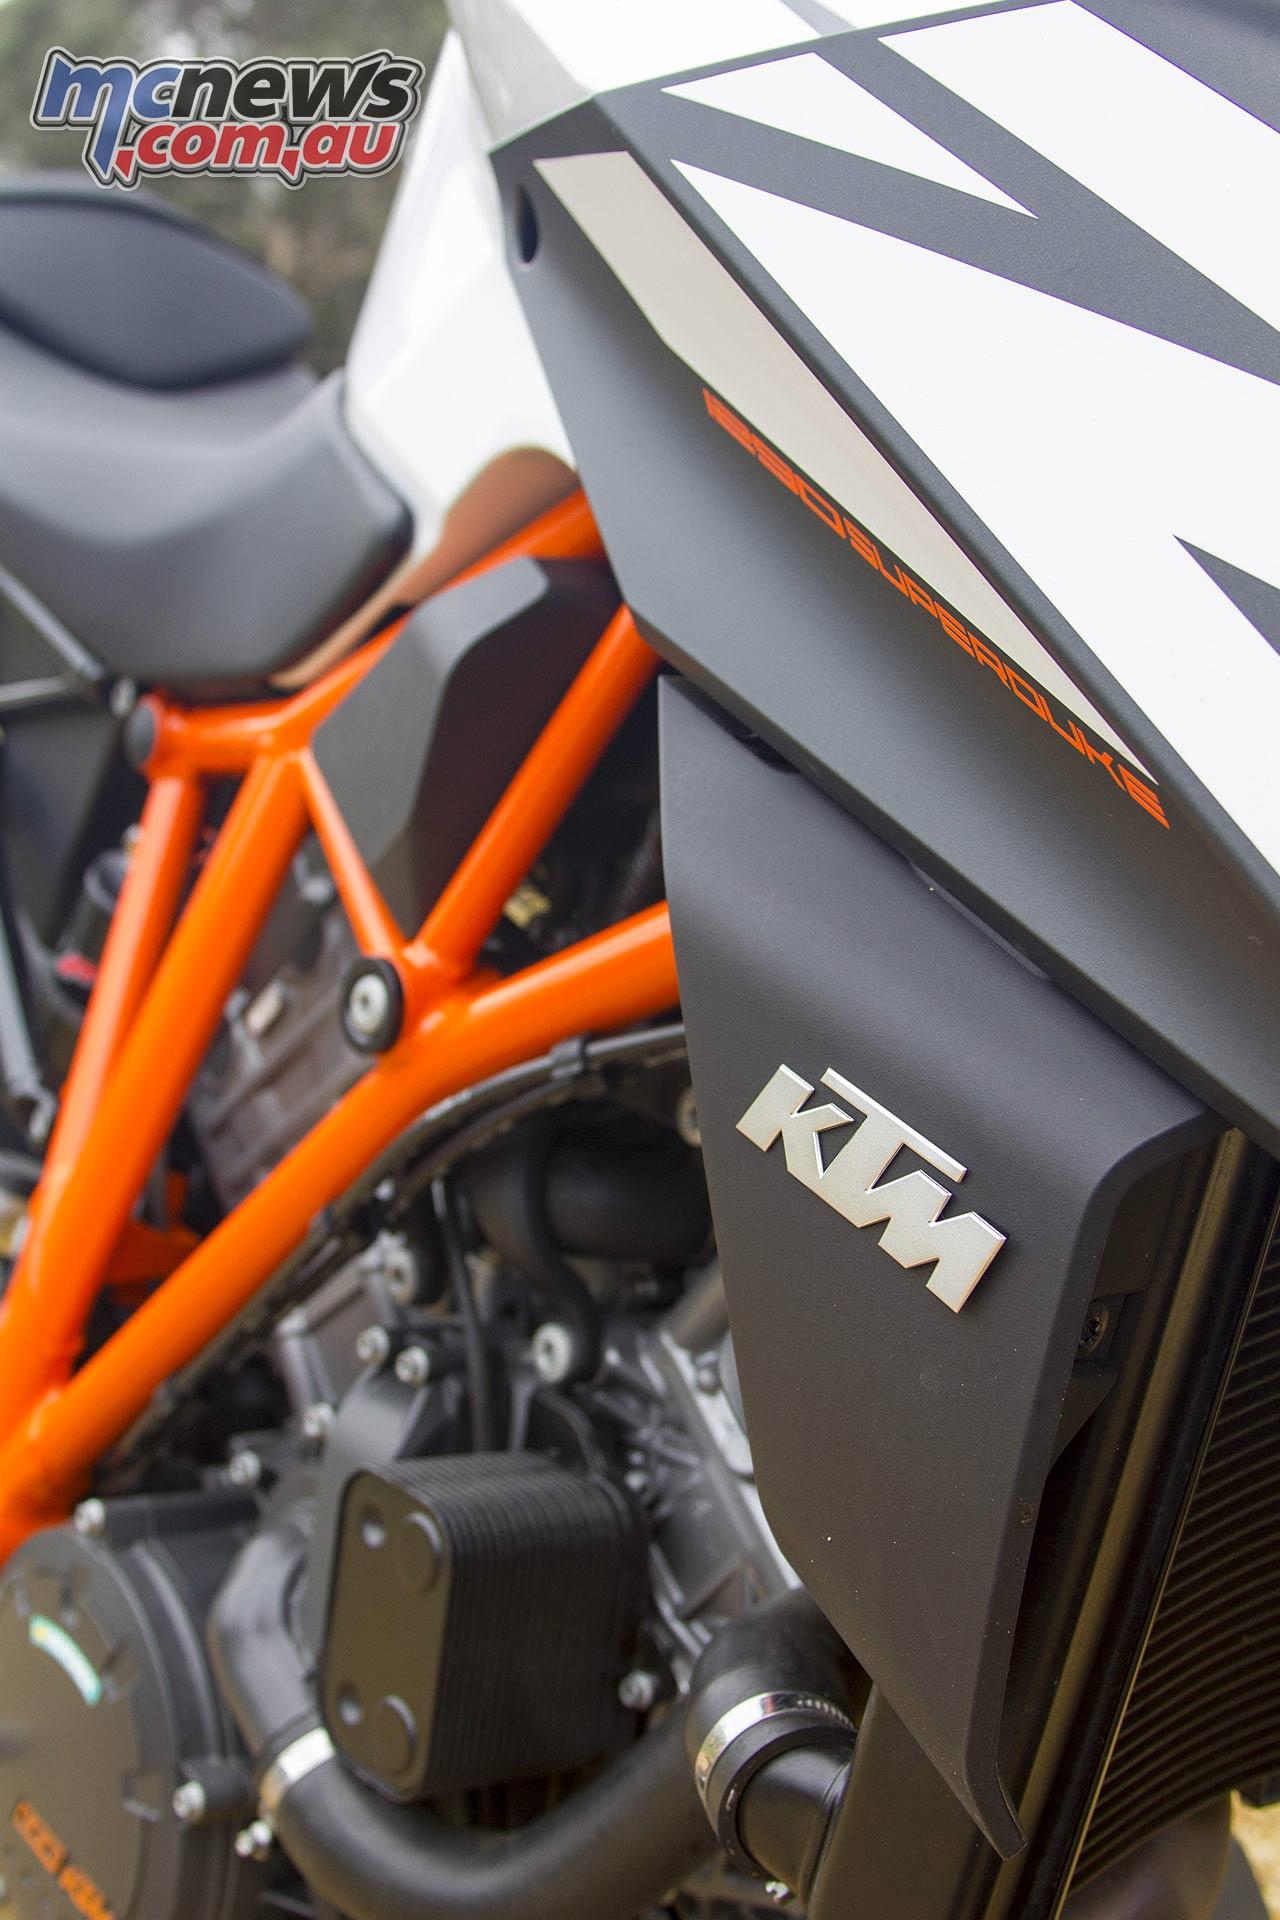 KTM SDR WV